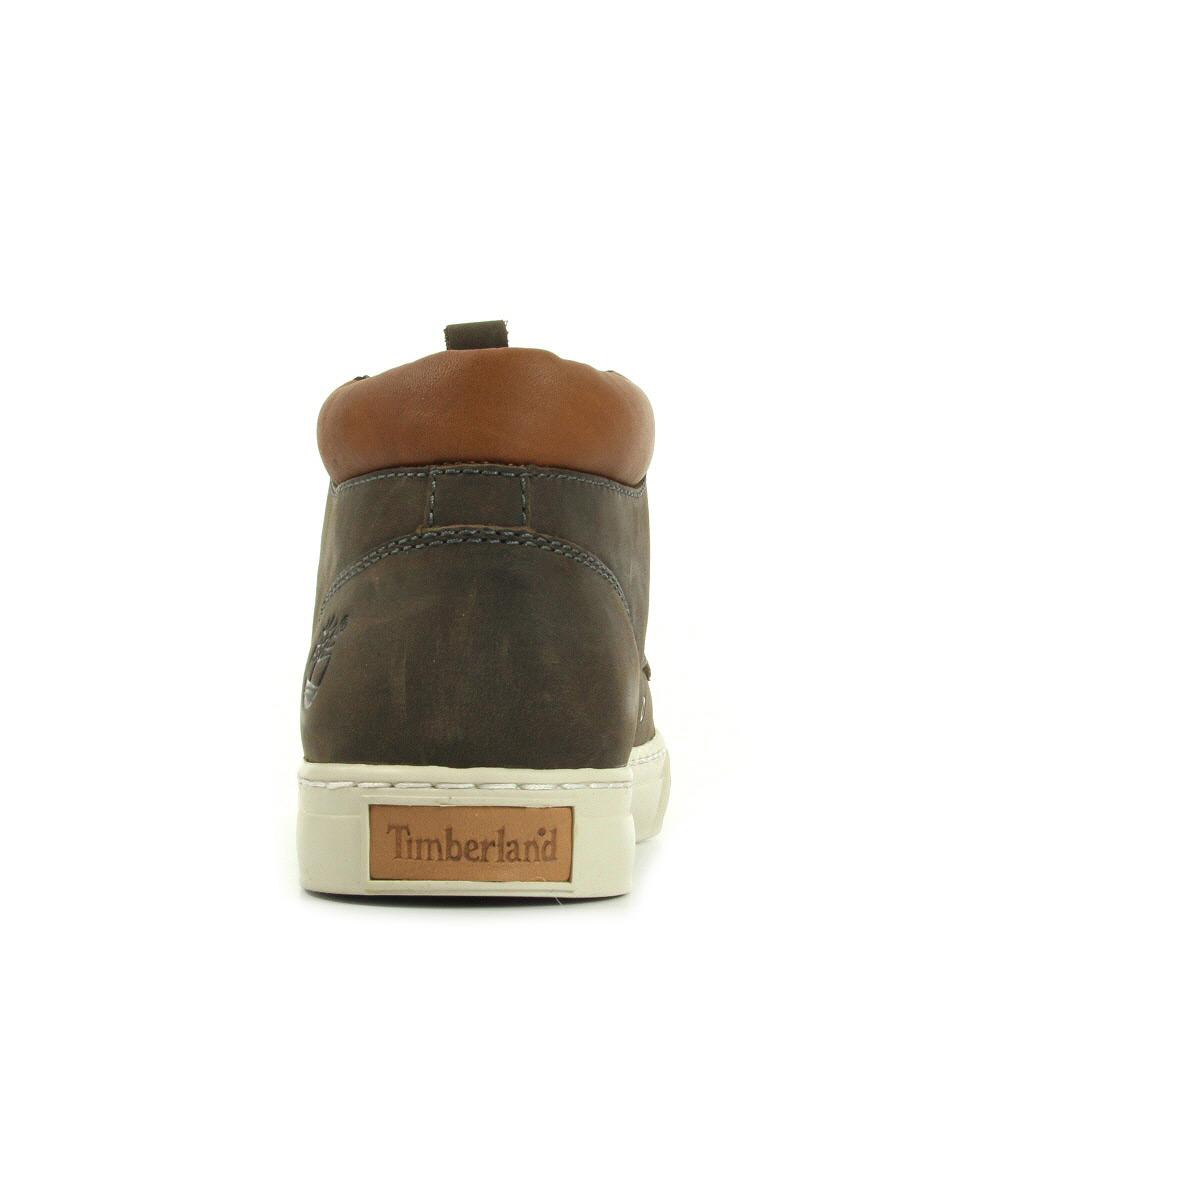 timberland cupsole chukka